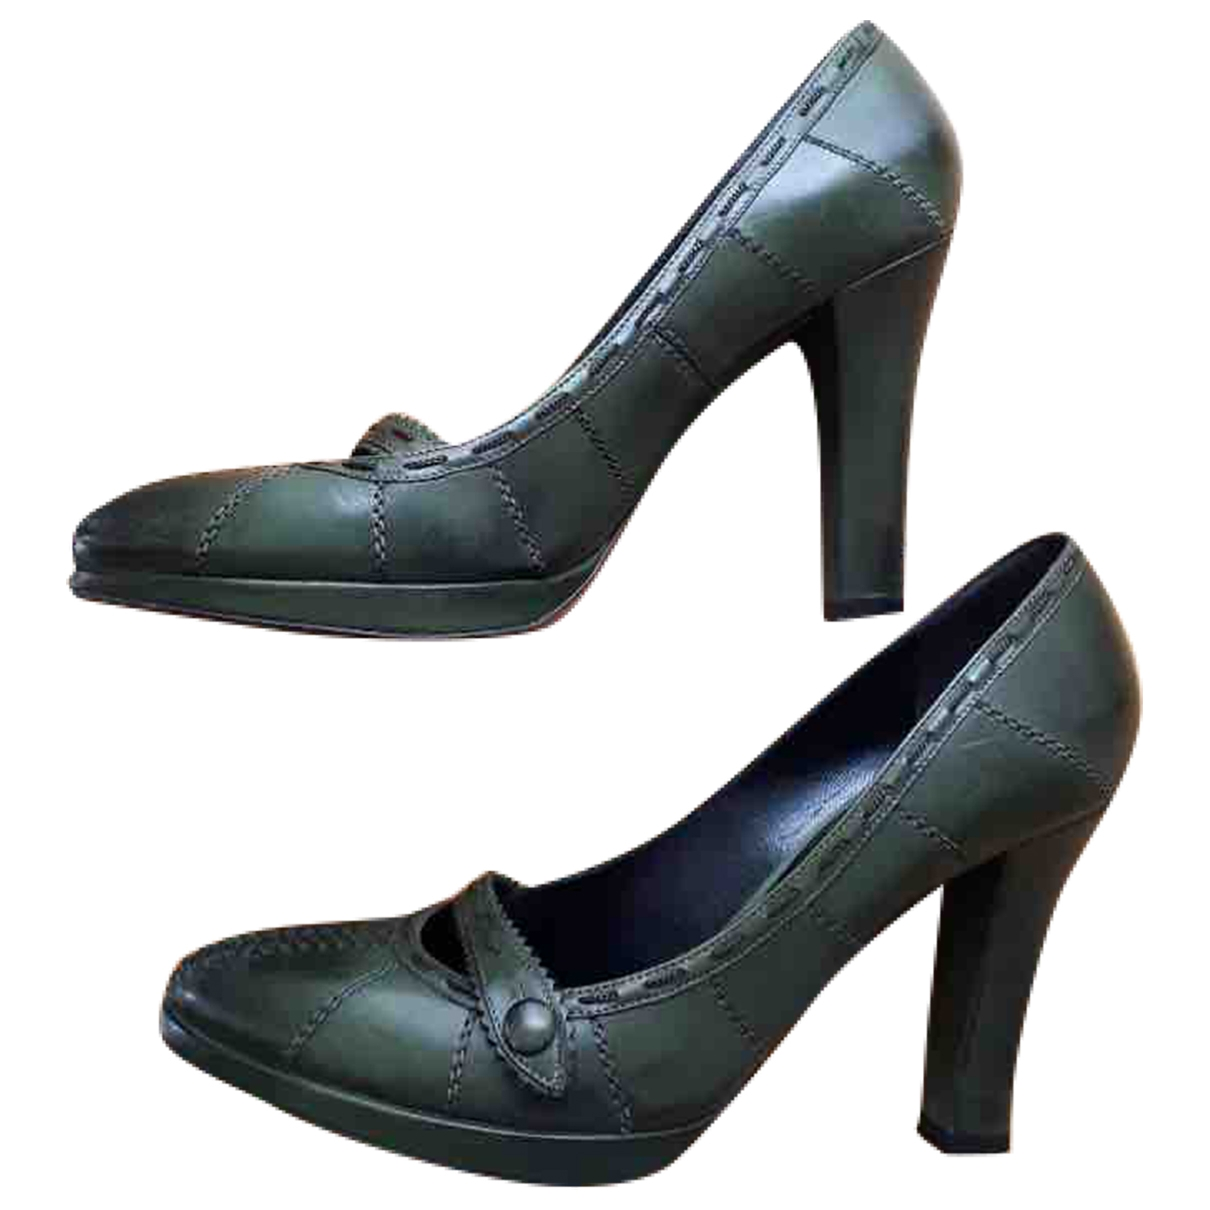 Bottega Veneta - Escarpins   pour femme en cuir - vert